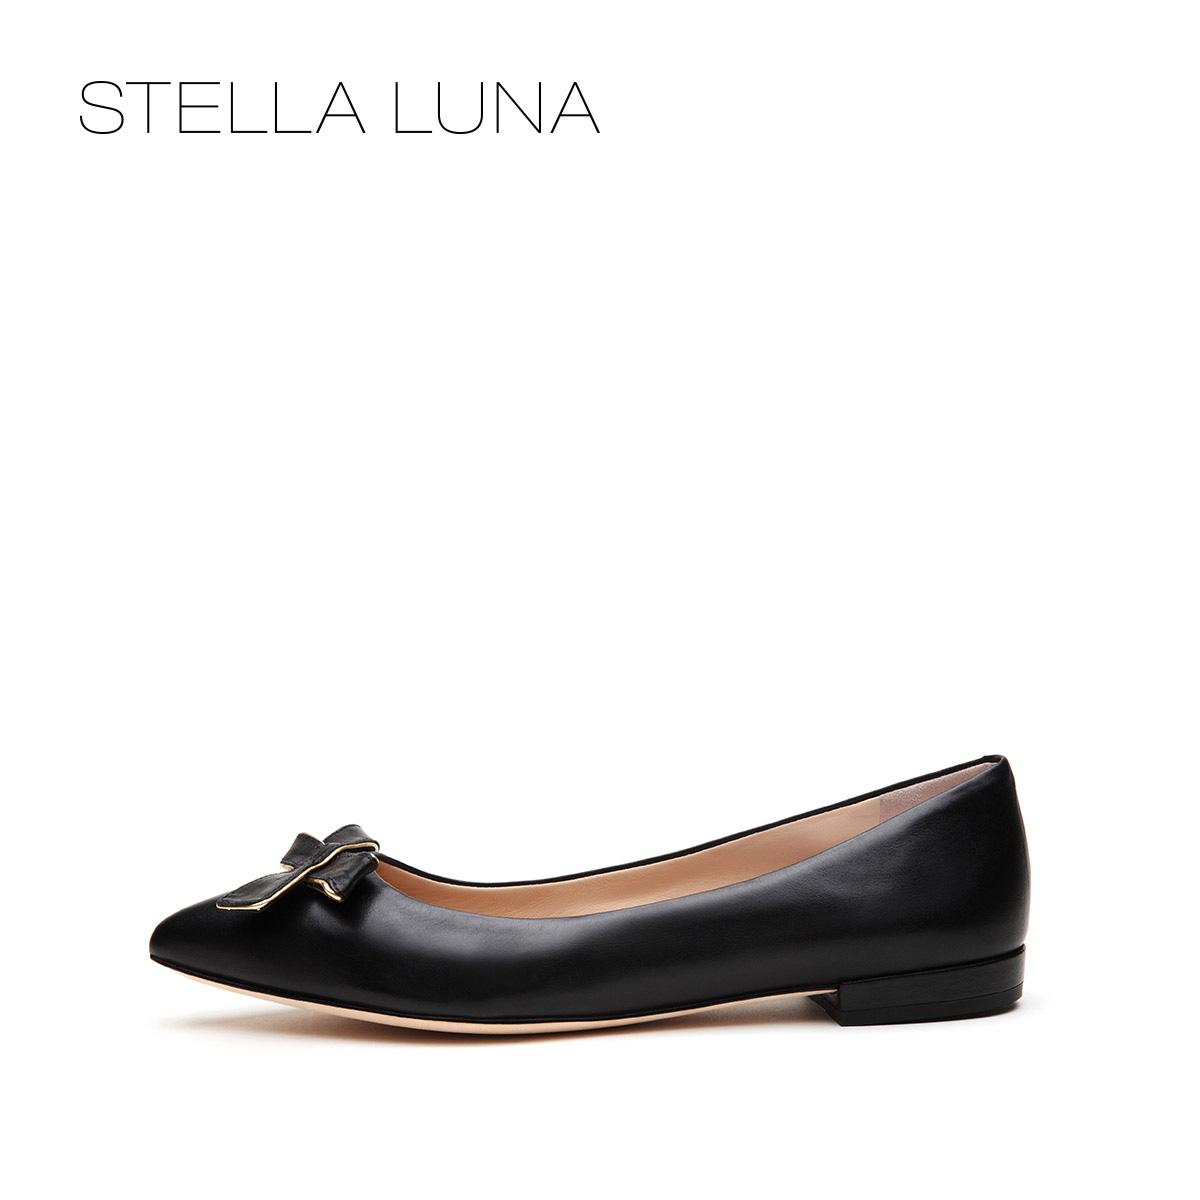 STELLA LUNA春夏浅口套脚女鞋牛皮蝴蝶结低跟单鞋SG134L24823